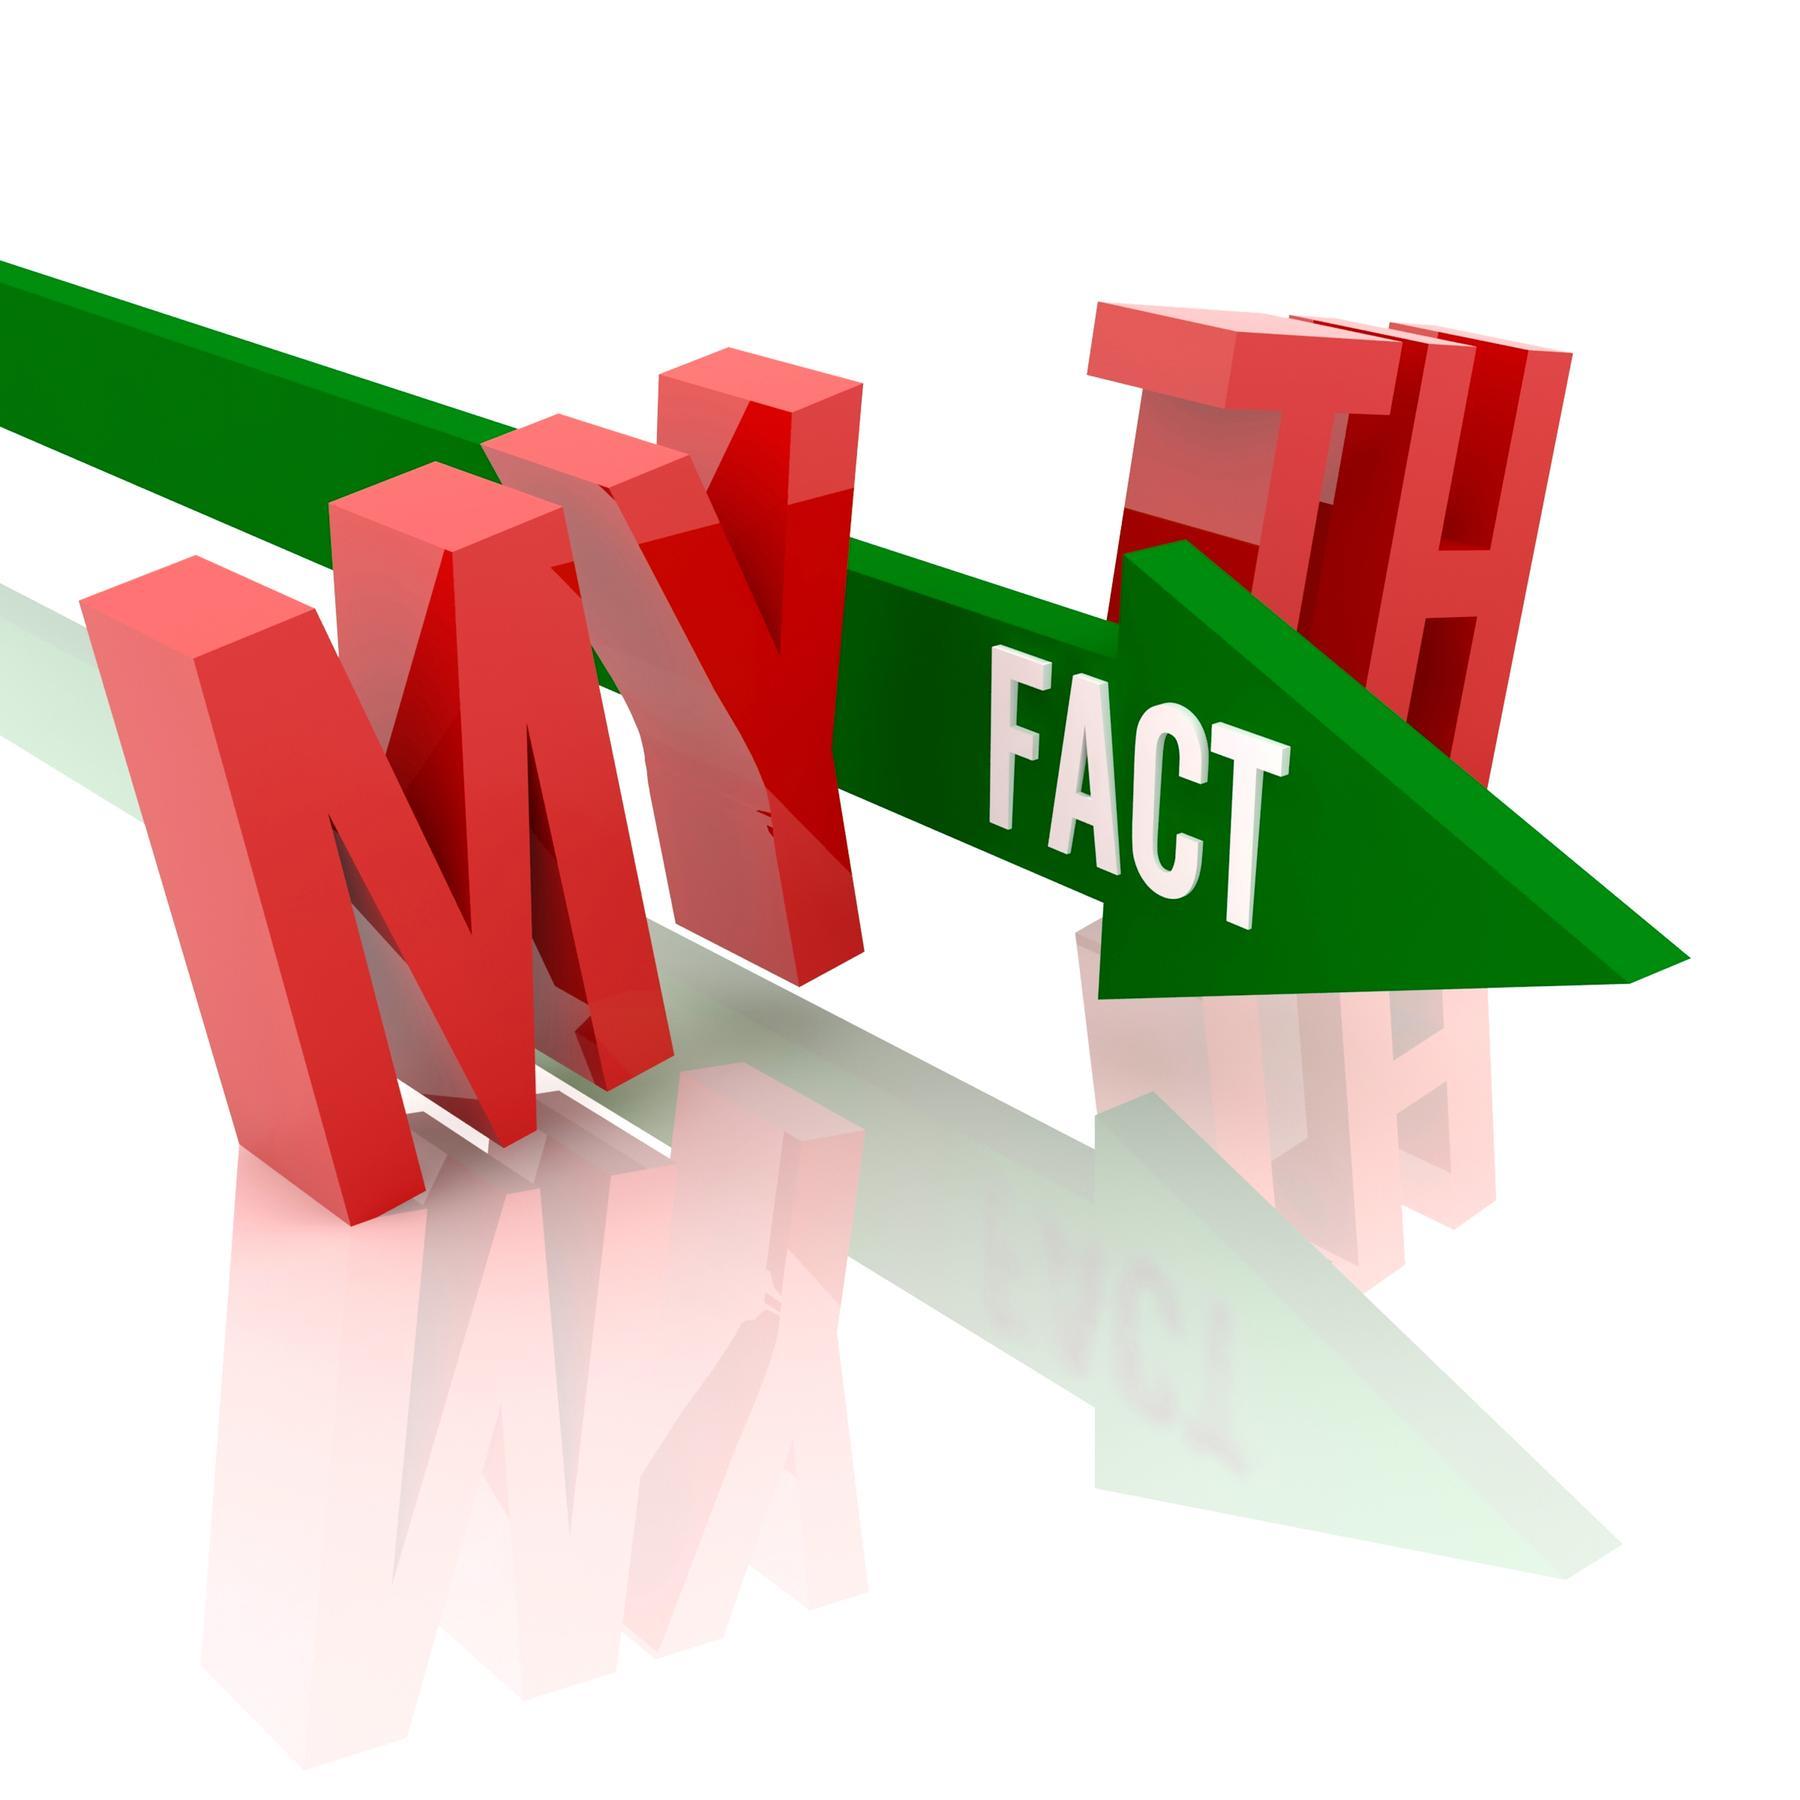 Moderne Mythen - Zu gut, um falsch zu sein